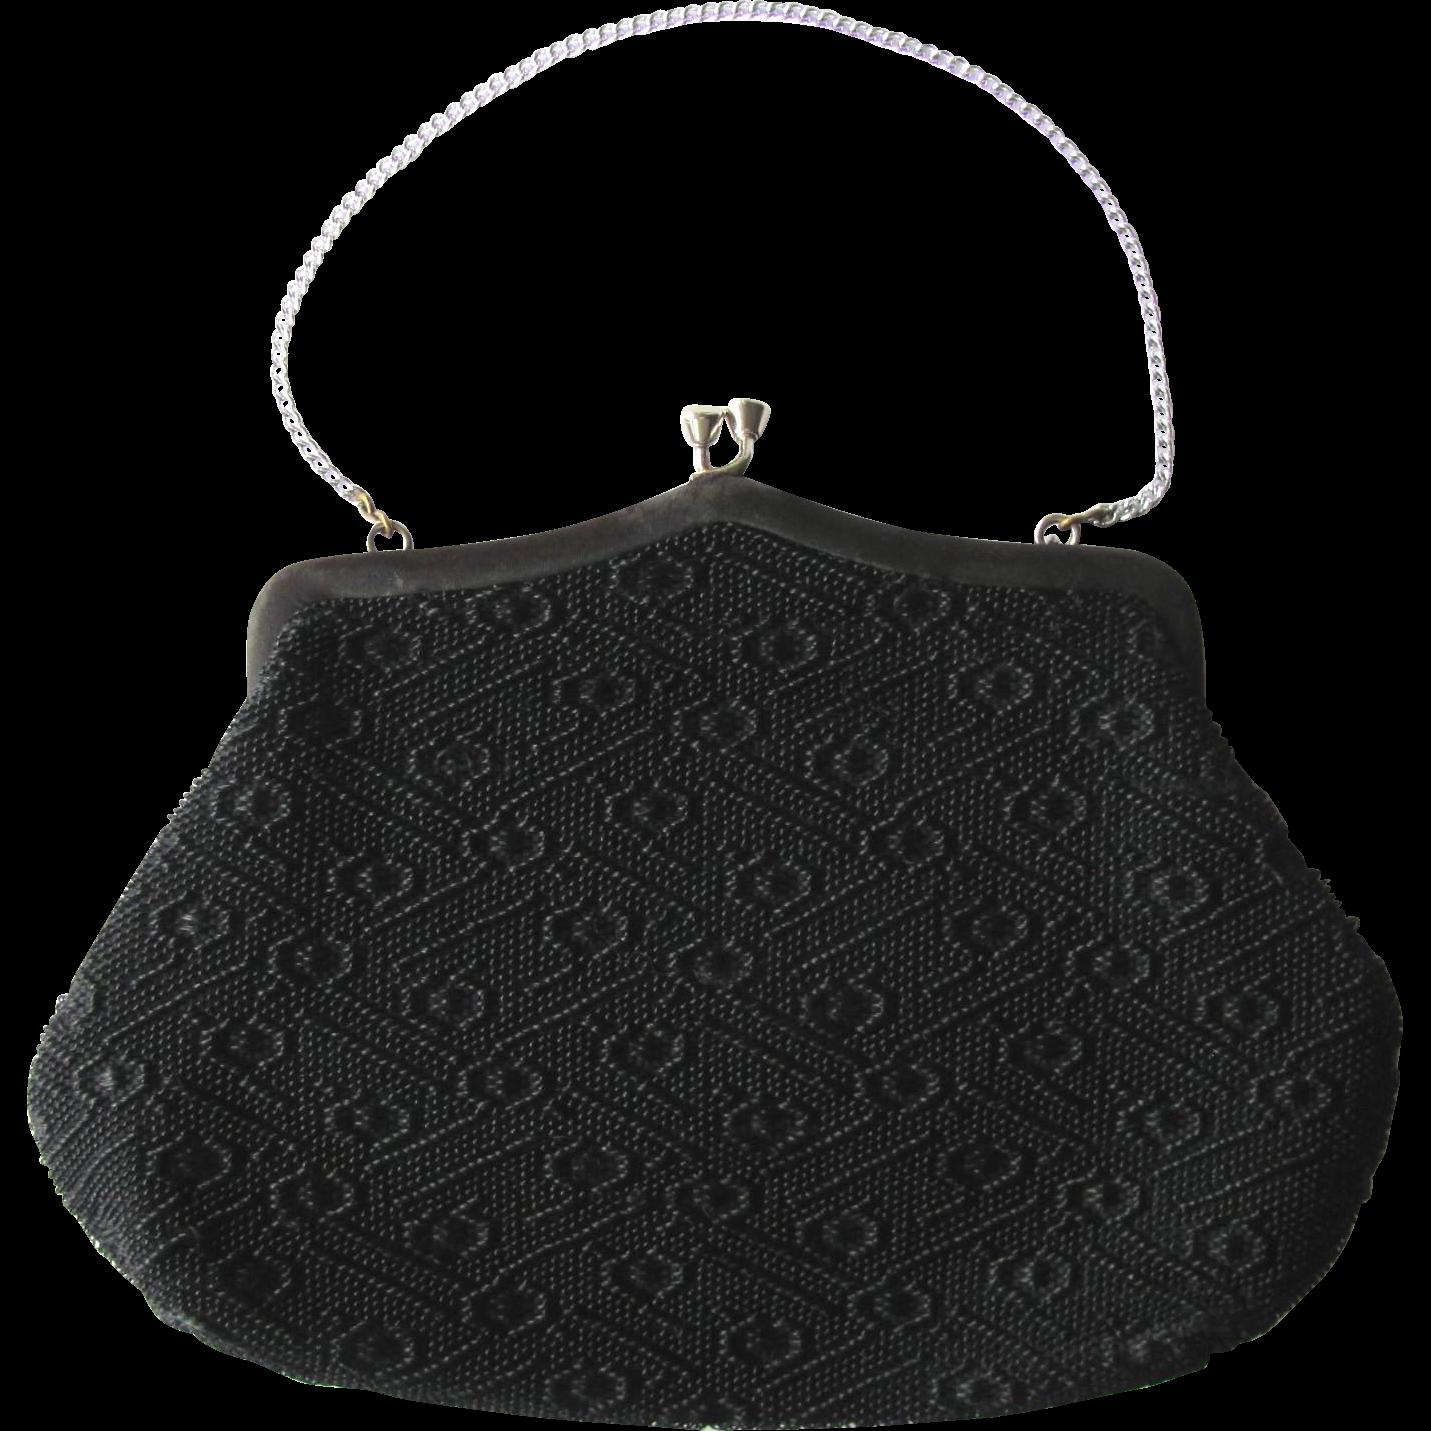 Vintage 1940s Black Tapestry Handbag with Geometric Pattern by Noveltrim NSW Australia